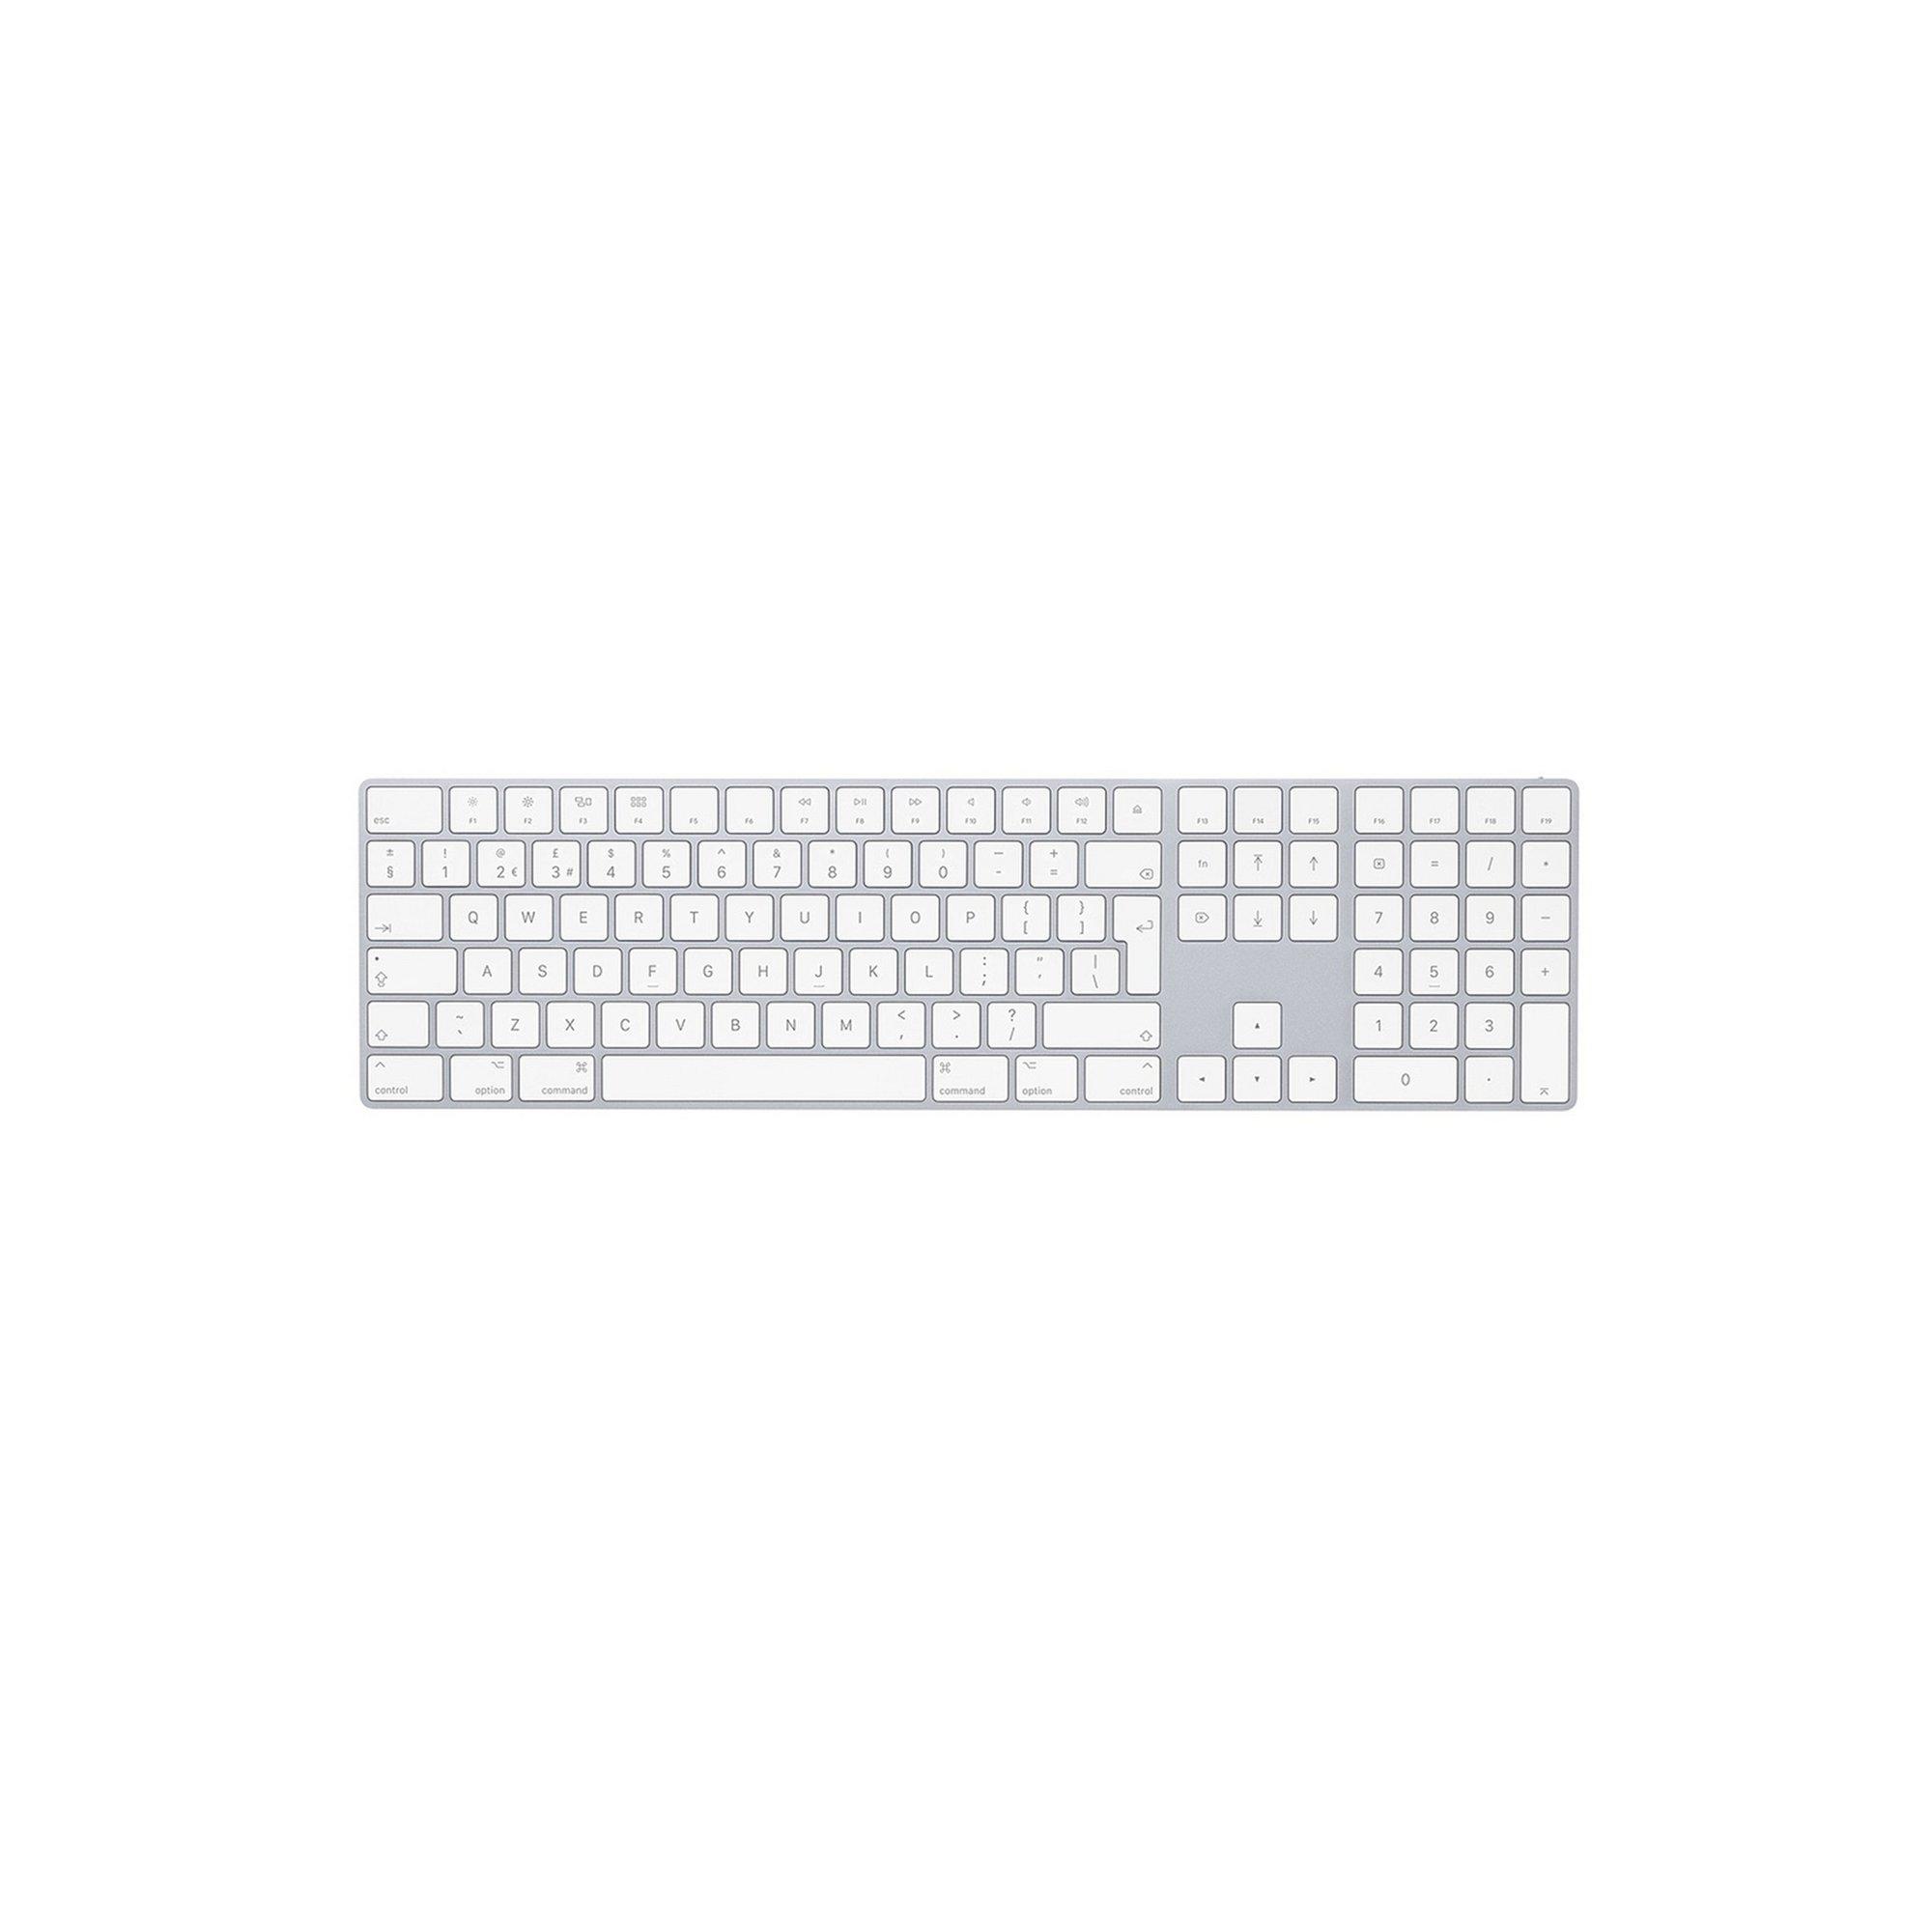 Image of Apple Magic Wireless Keyboard with Numeric Keypad